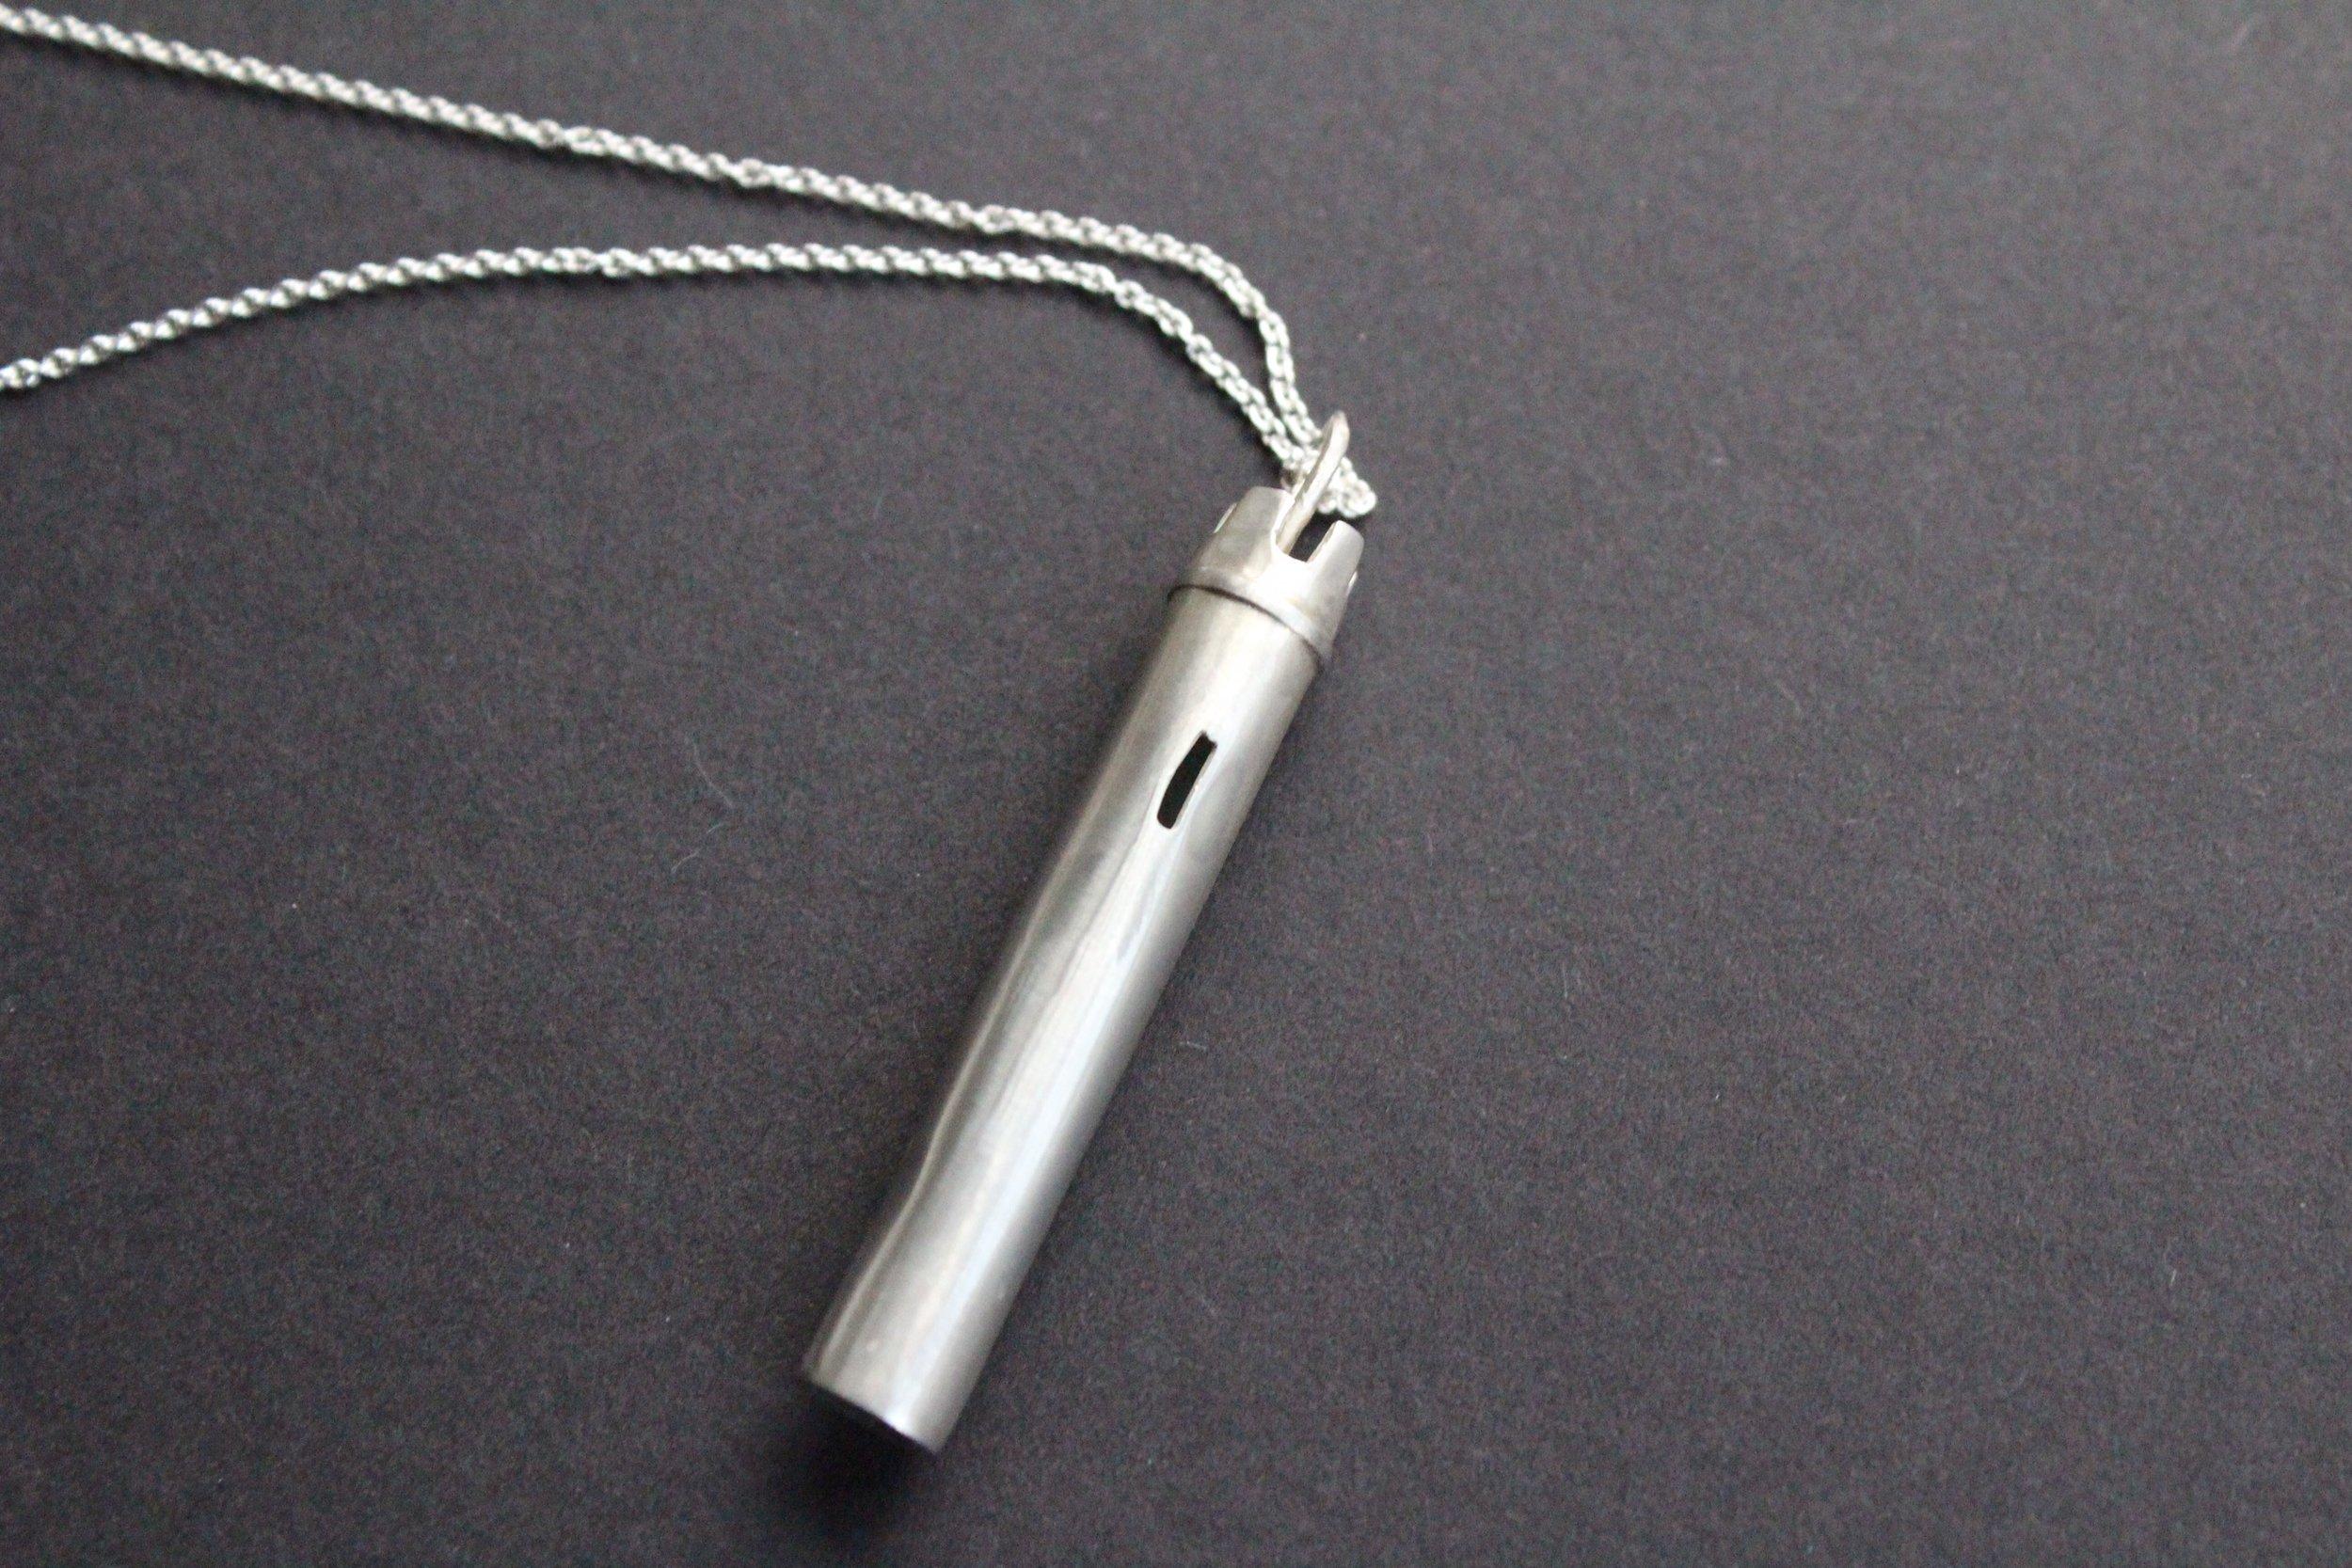 Silver: 43mm x 7mm diameter